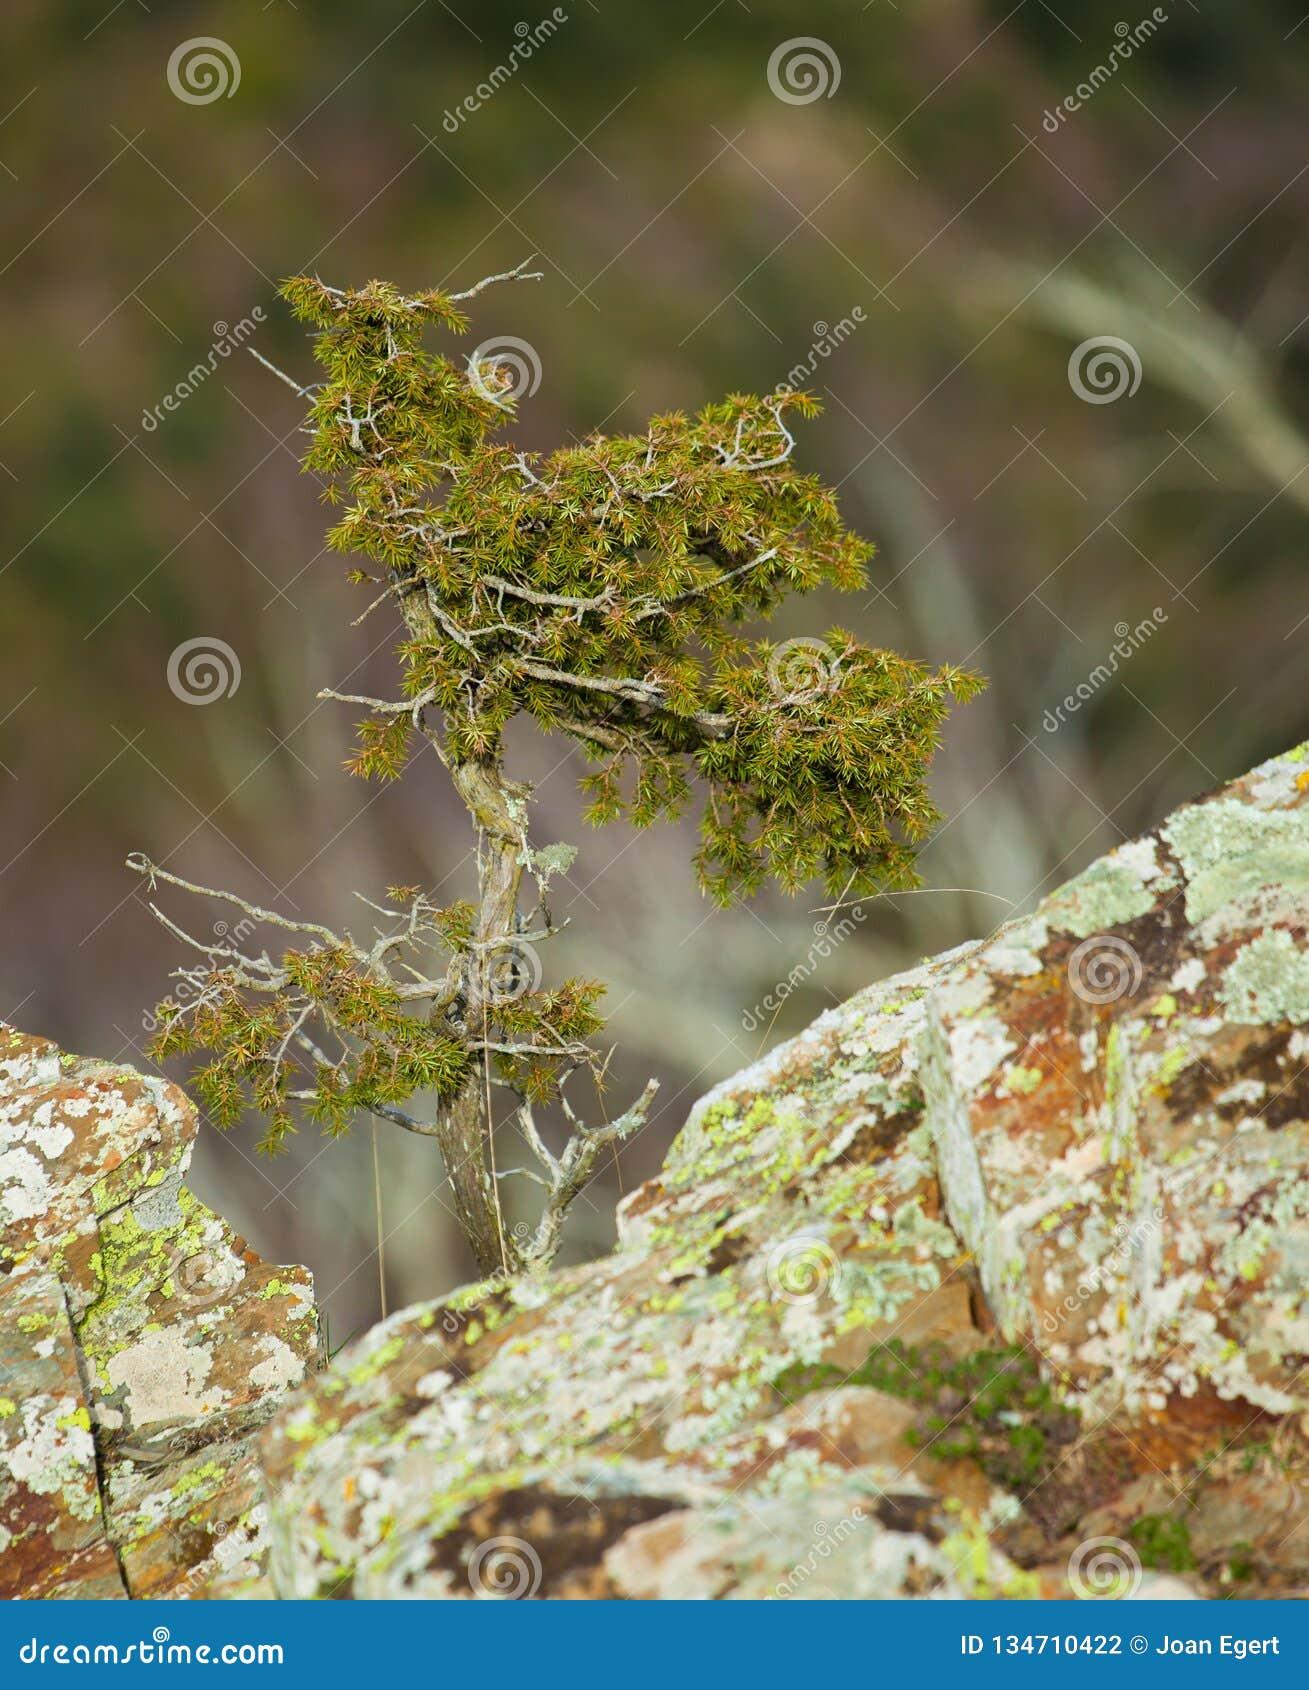 Common Juniper tree growing on highland rocks